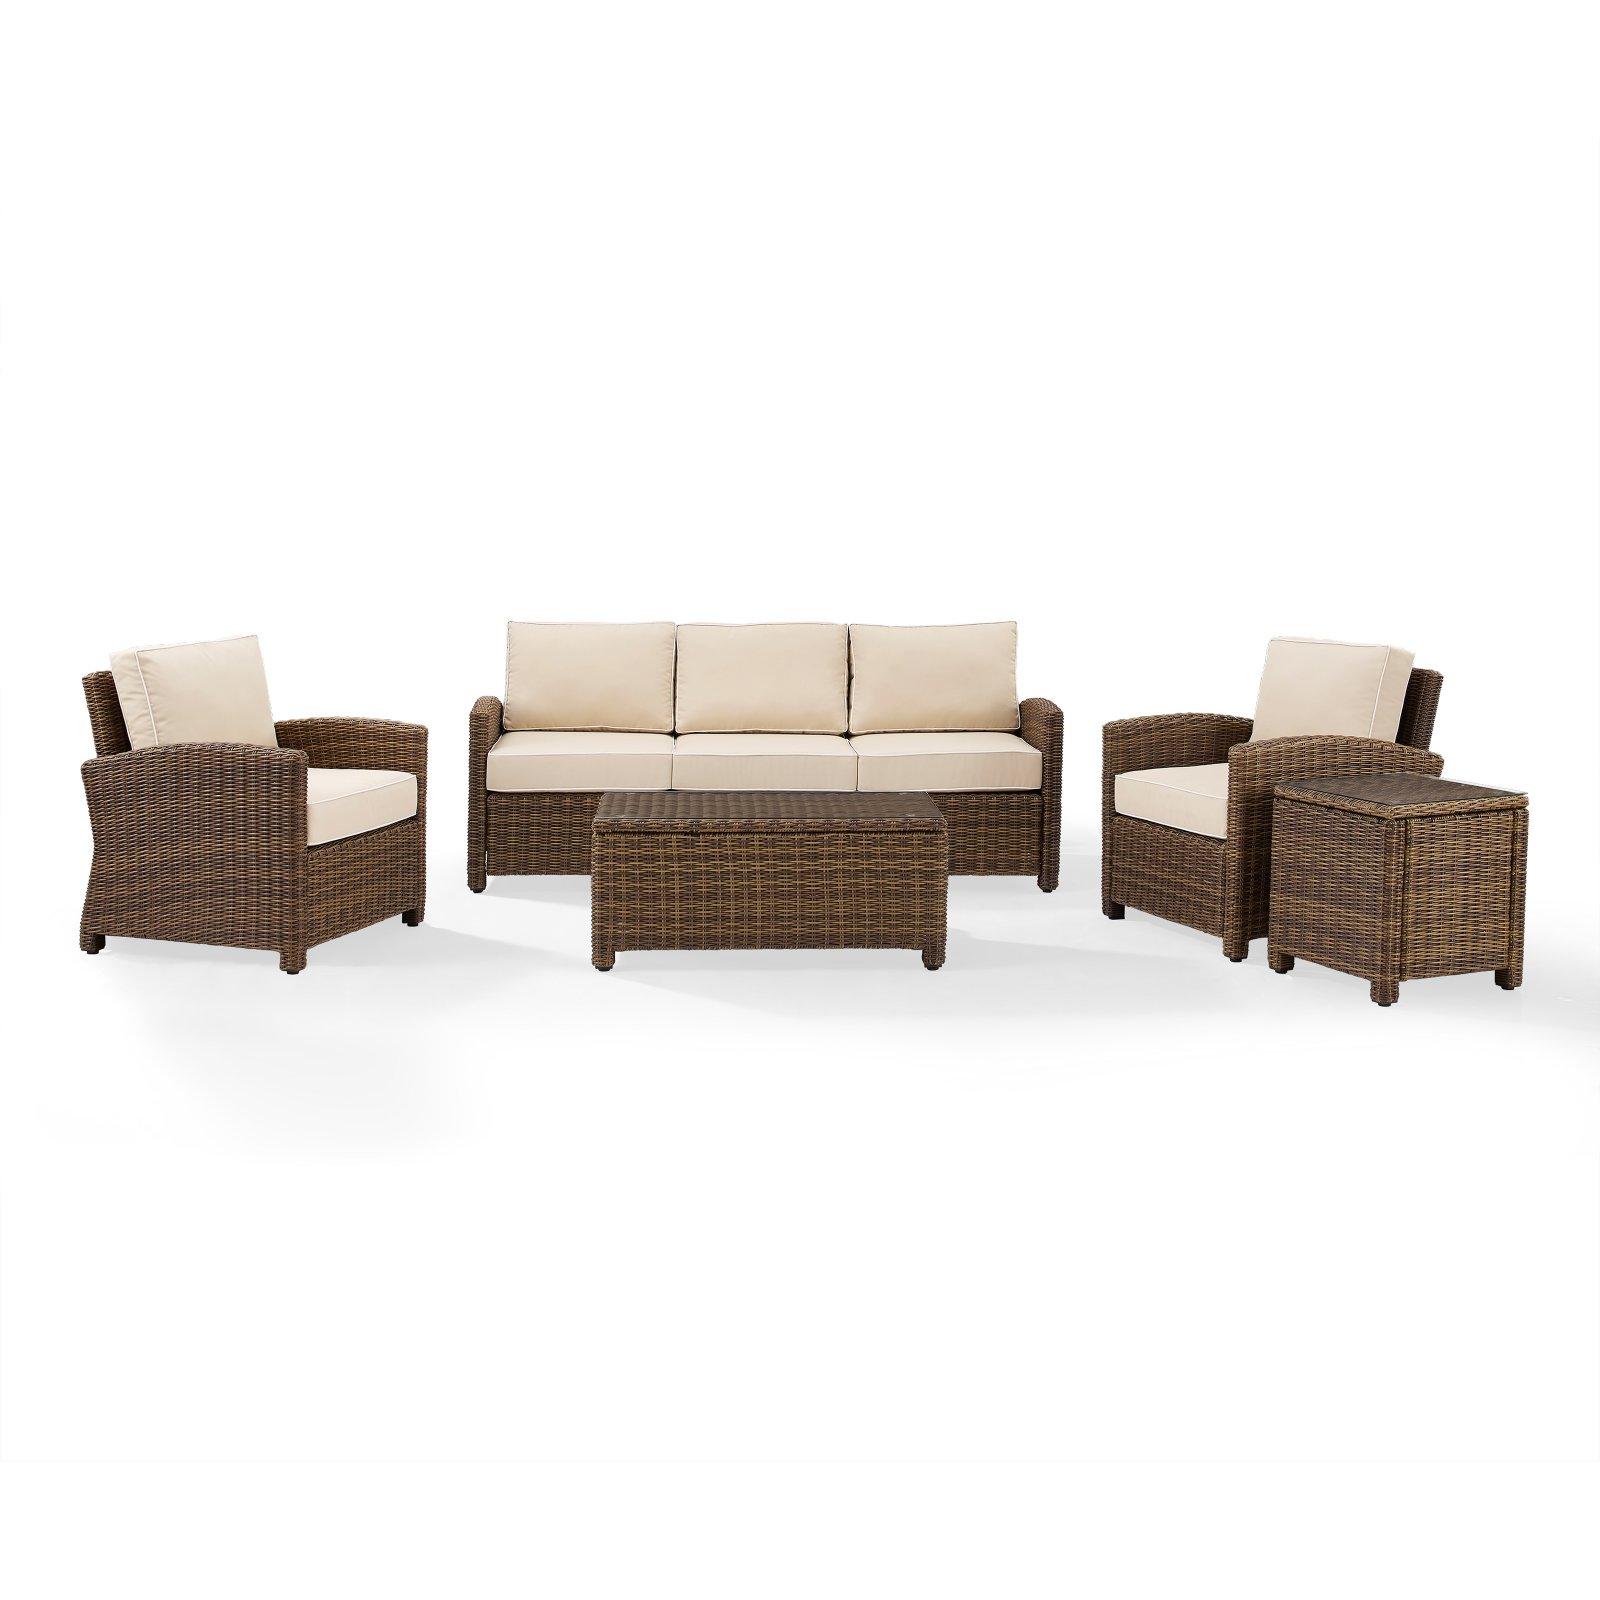 Crosley Furniture Bradenton 5-Piece Outdoor Wicker Sofa Conversation Set with Navy Cushions Sofa, Two... by Crosley Brands, Inc